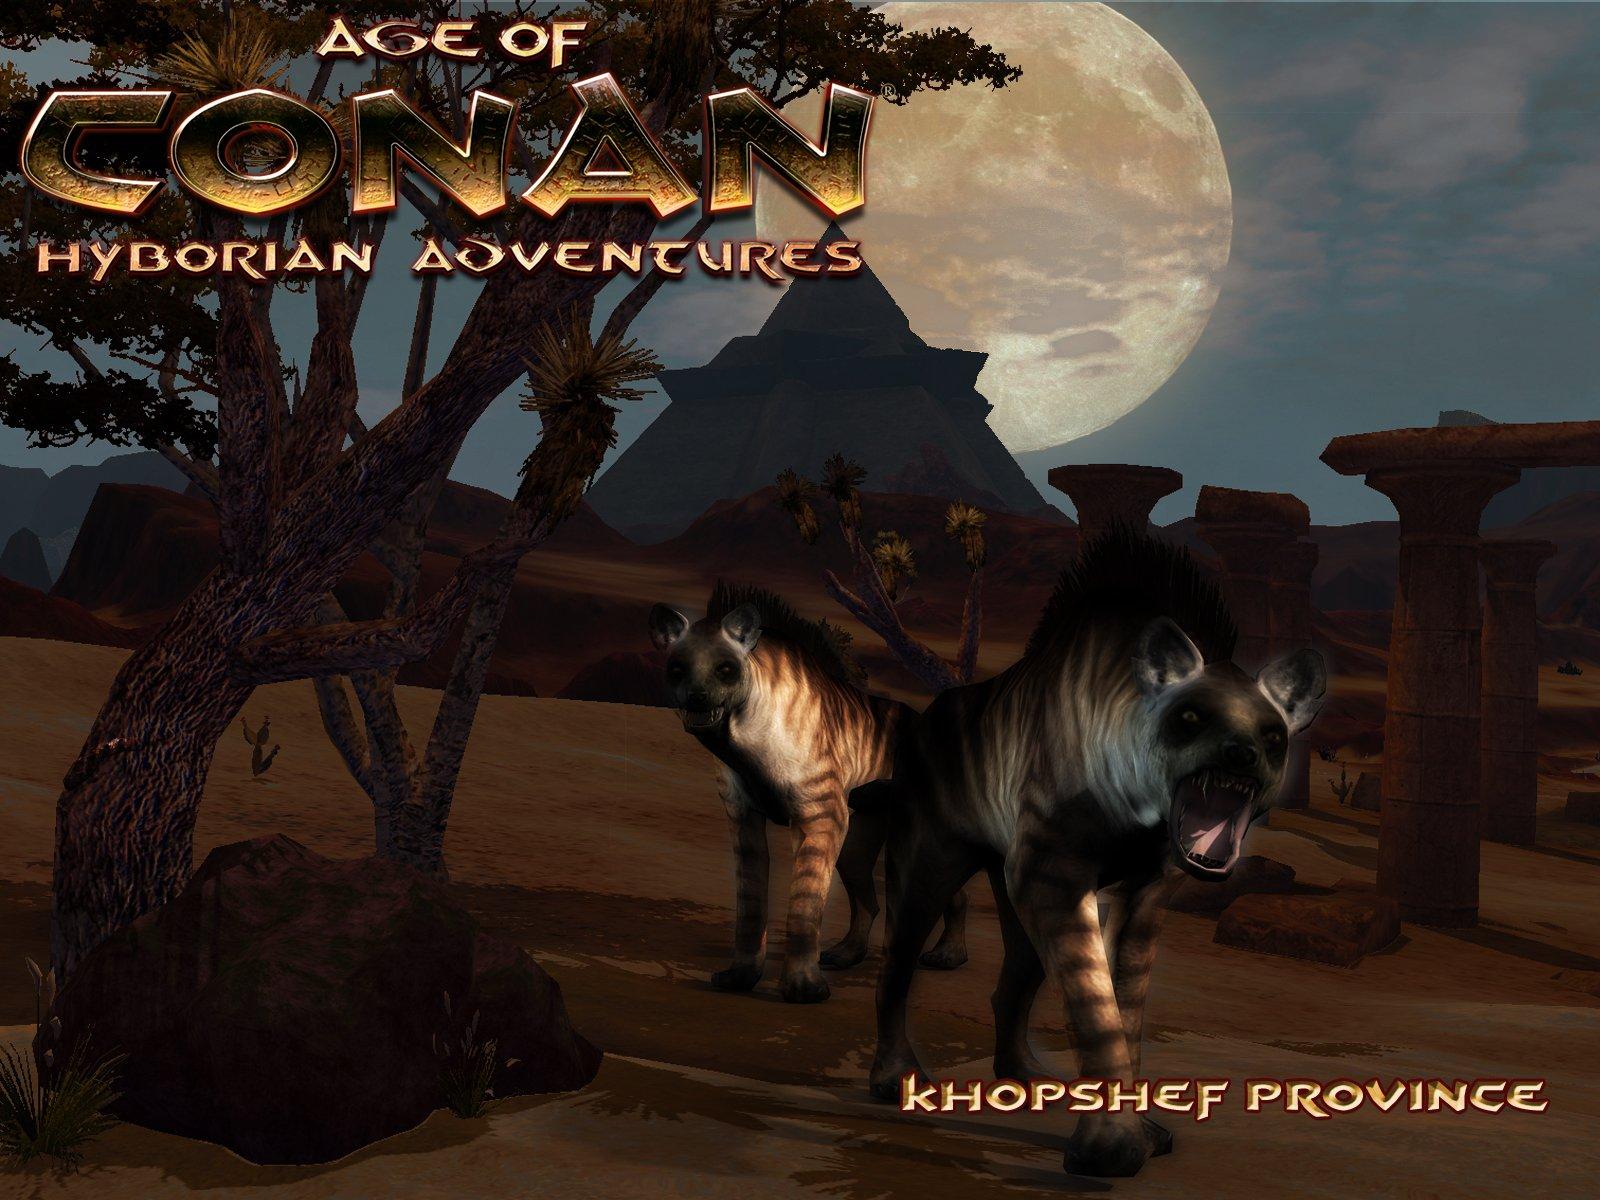 Age of Conan wallpaper 6